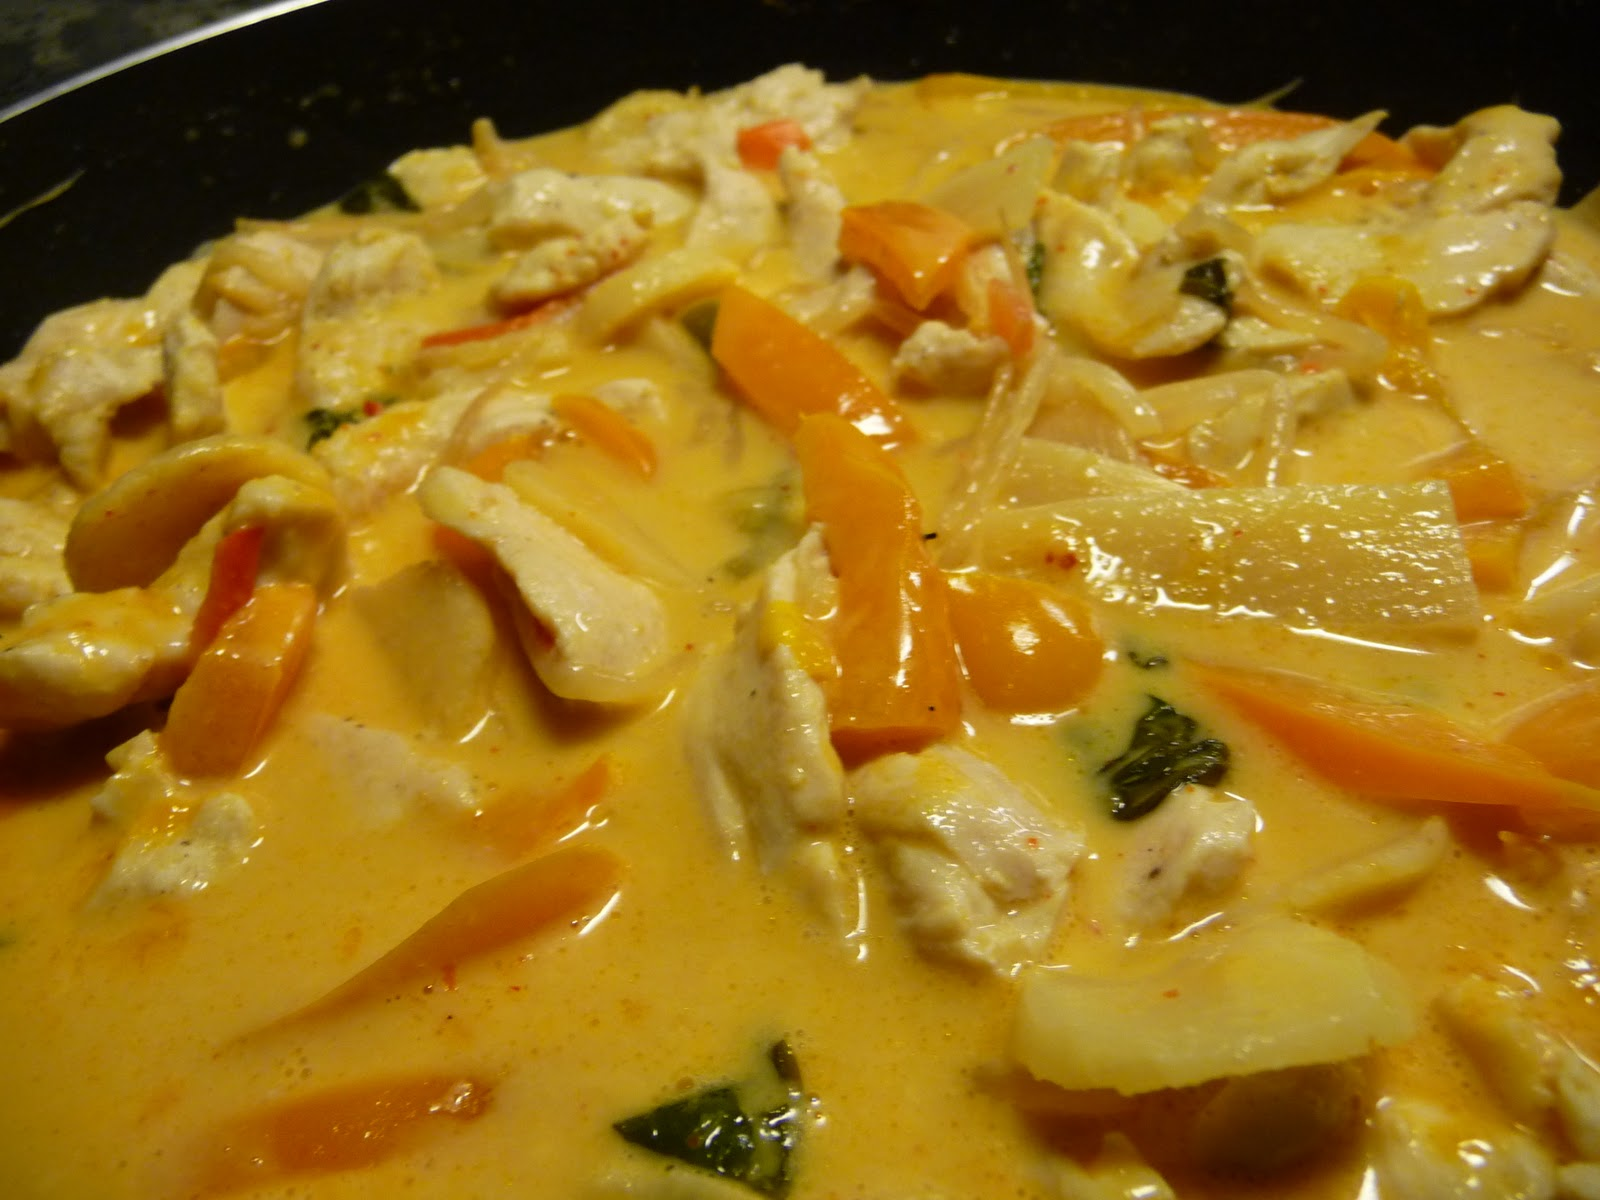 kyckling kokosmjölk röd curry wokgrönsaker